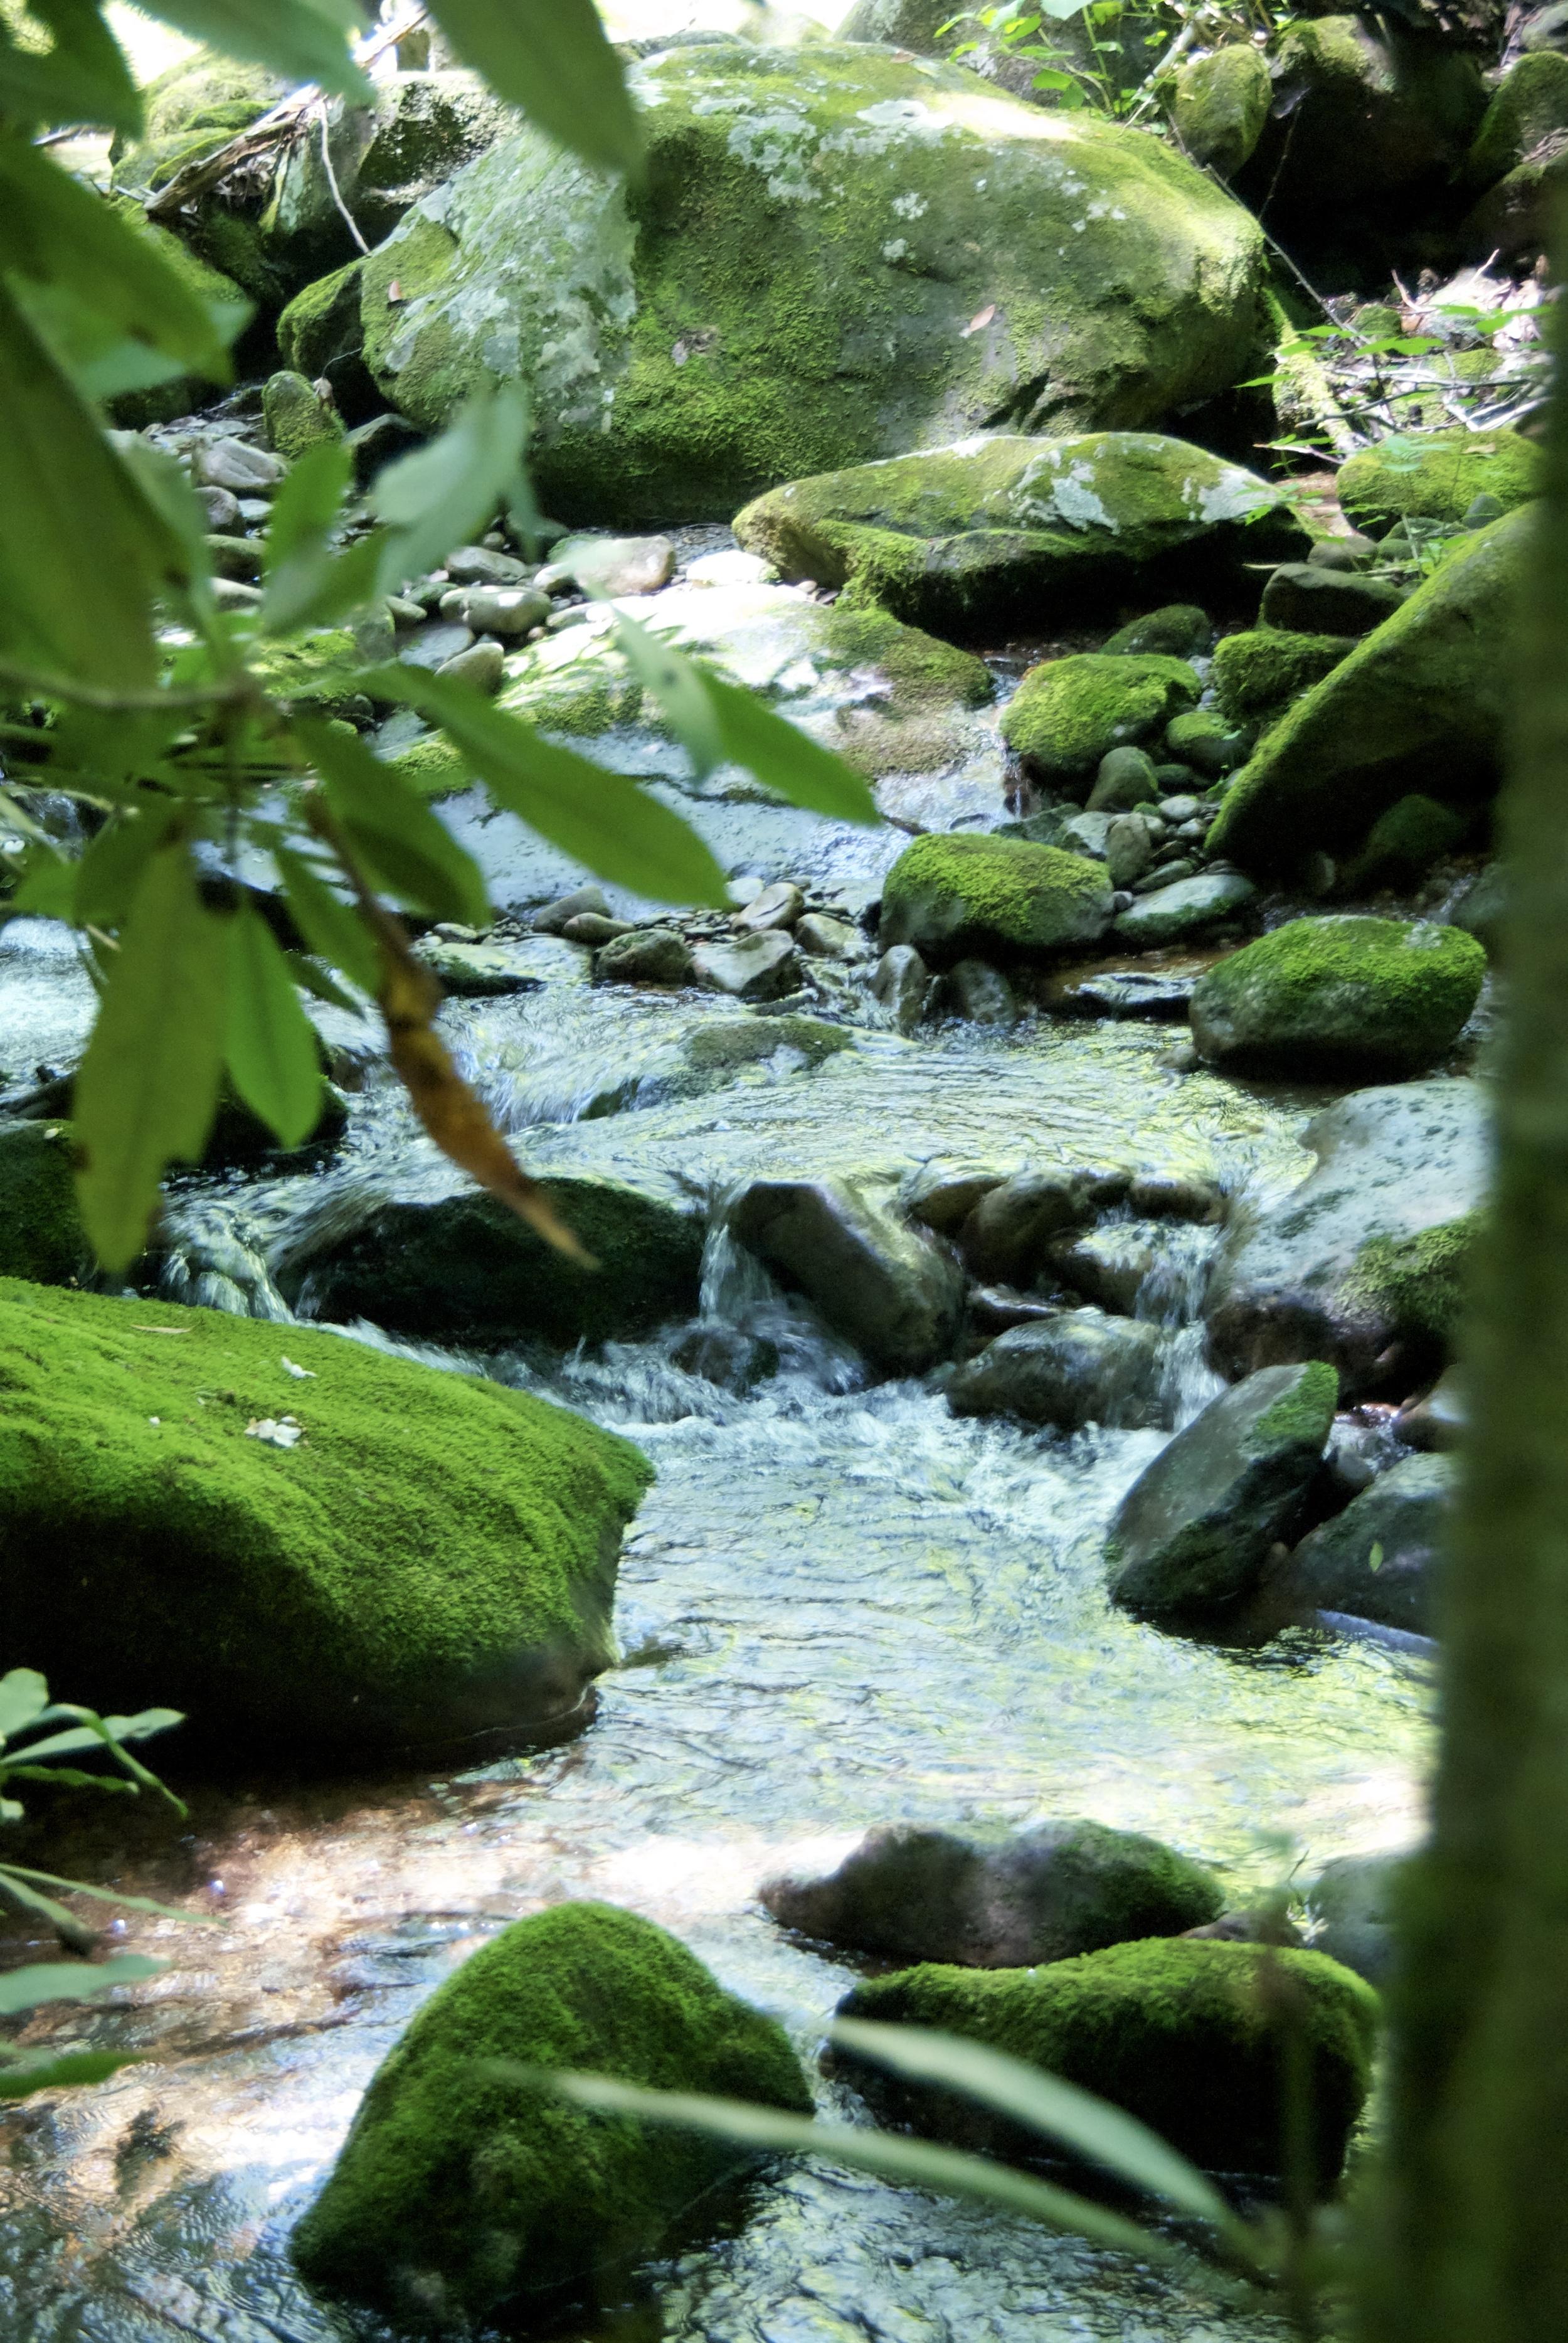 Rock Creek, along the hen wallow falls trail